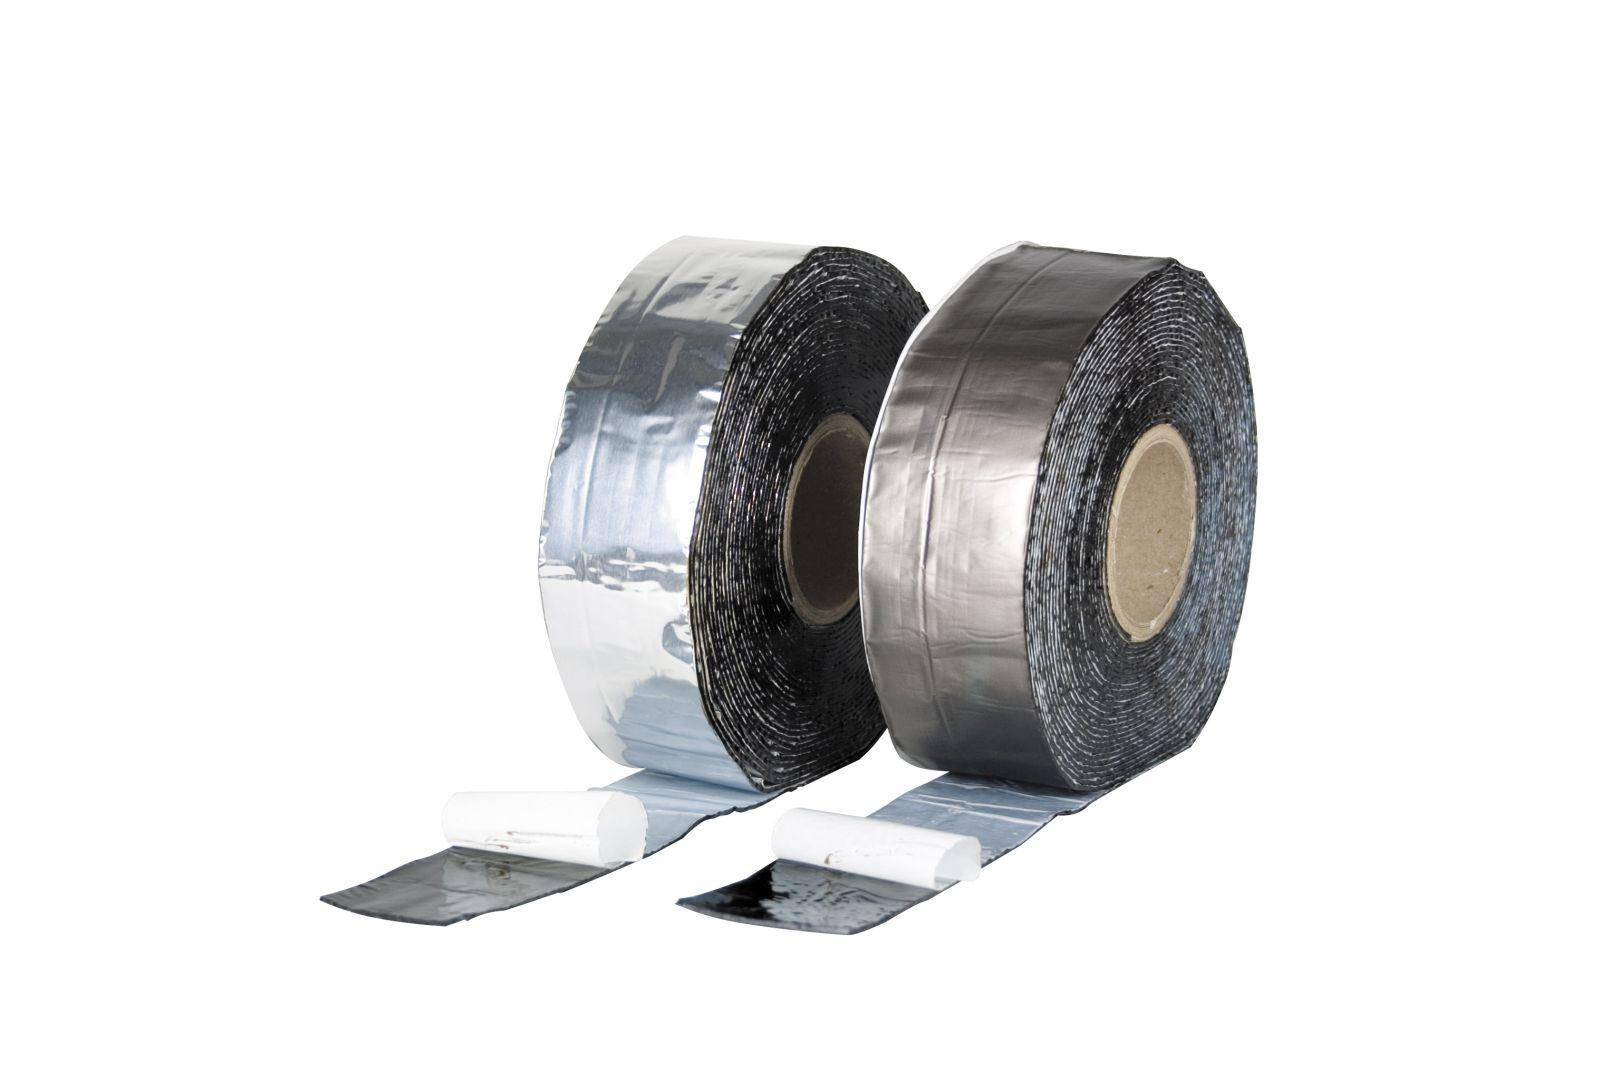 beko Bitumen-Universaldichtband, BT-Band 100 mm x 10 m, alu blank